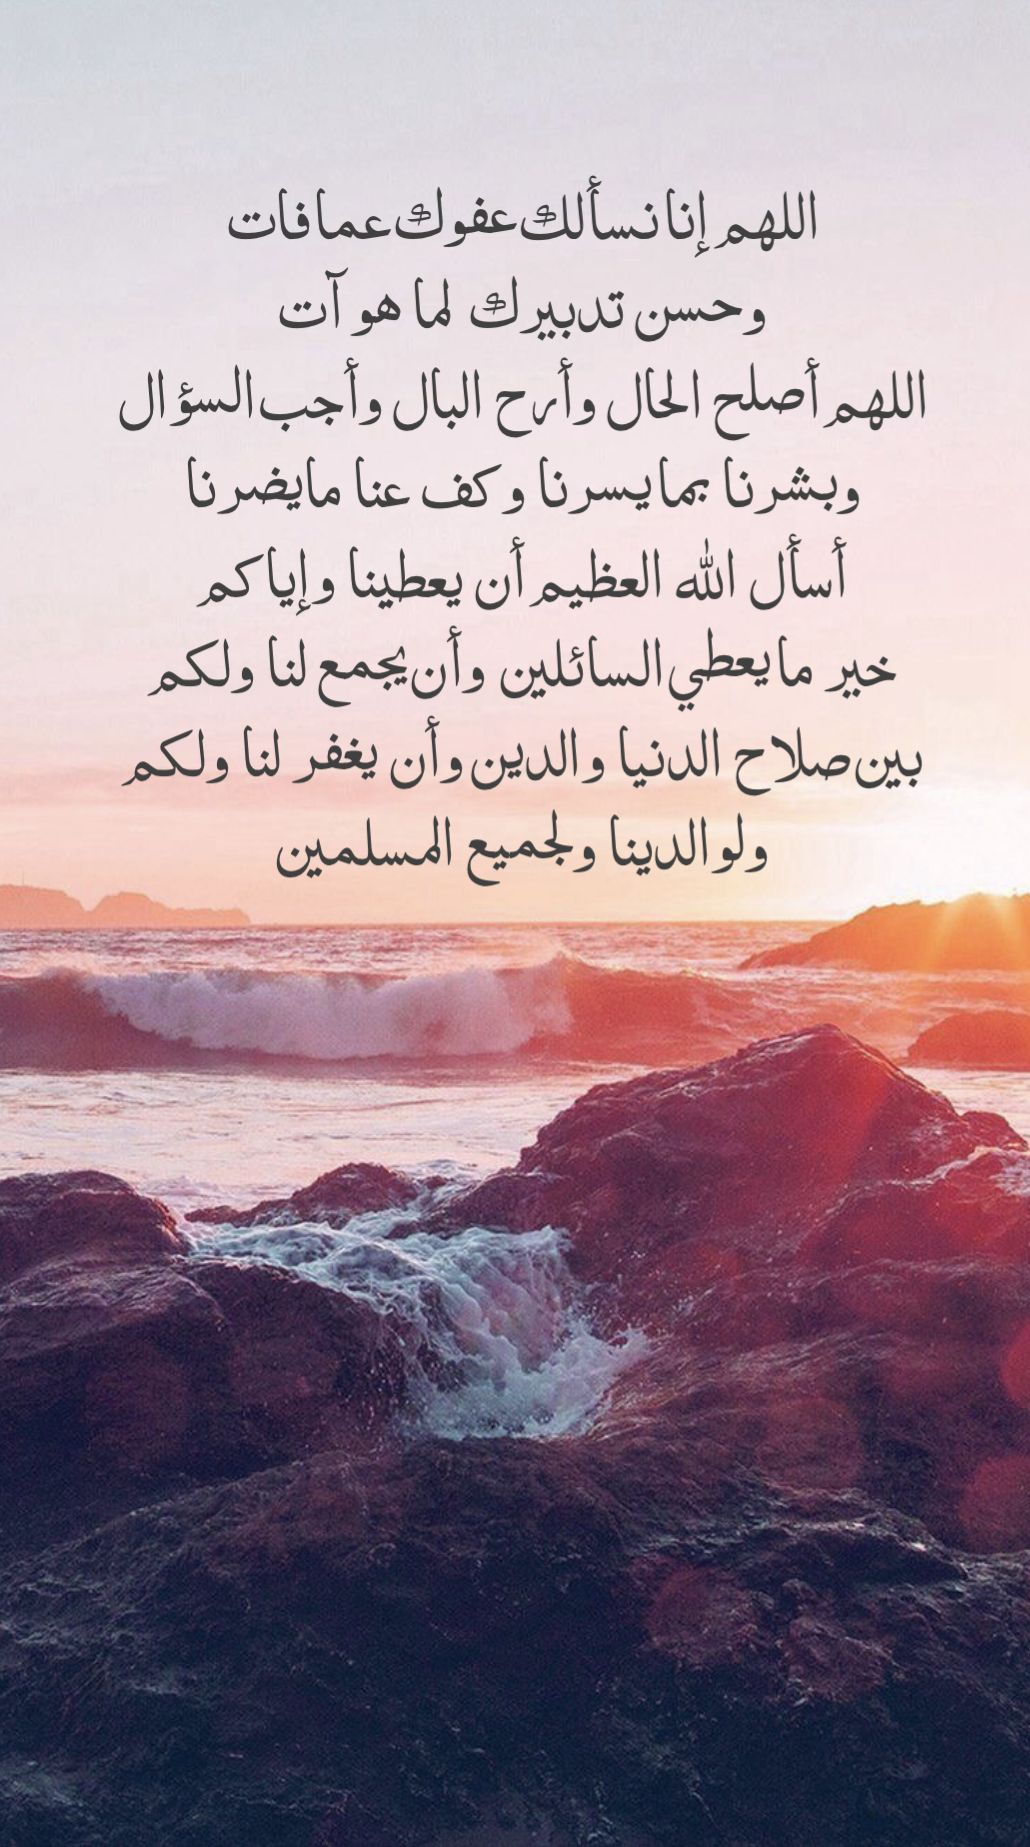 Pin By أدعية وأذكار On الدعاء Beautiful Islamic Quotes Islamic Quotes Quotes